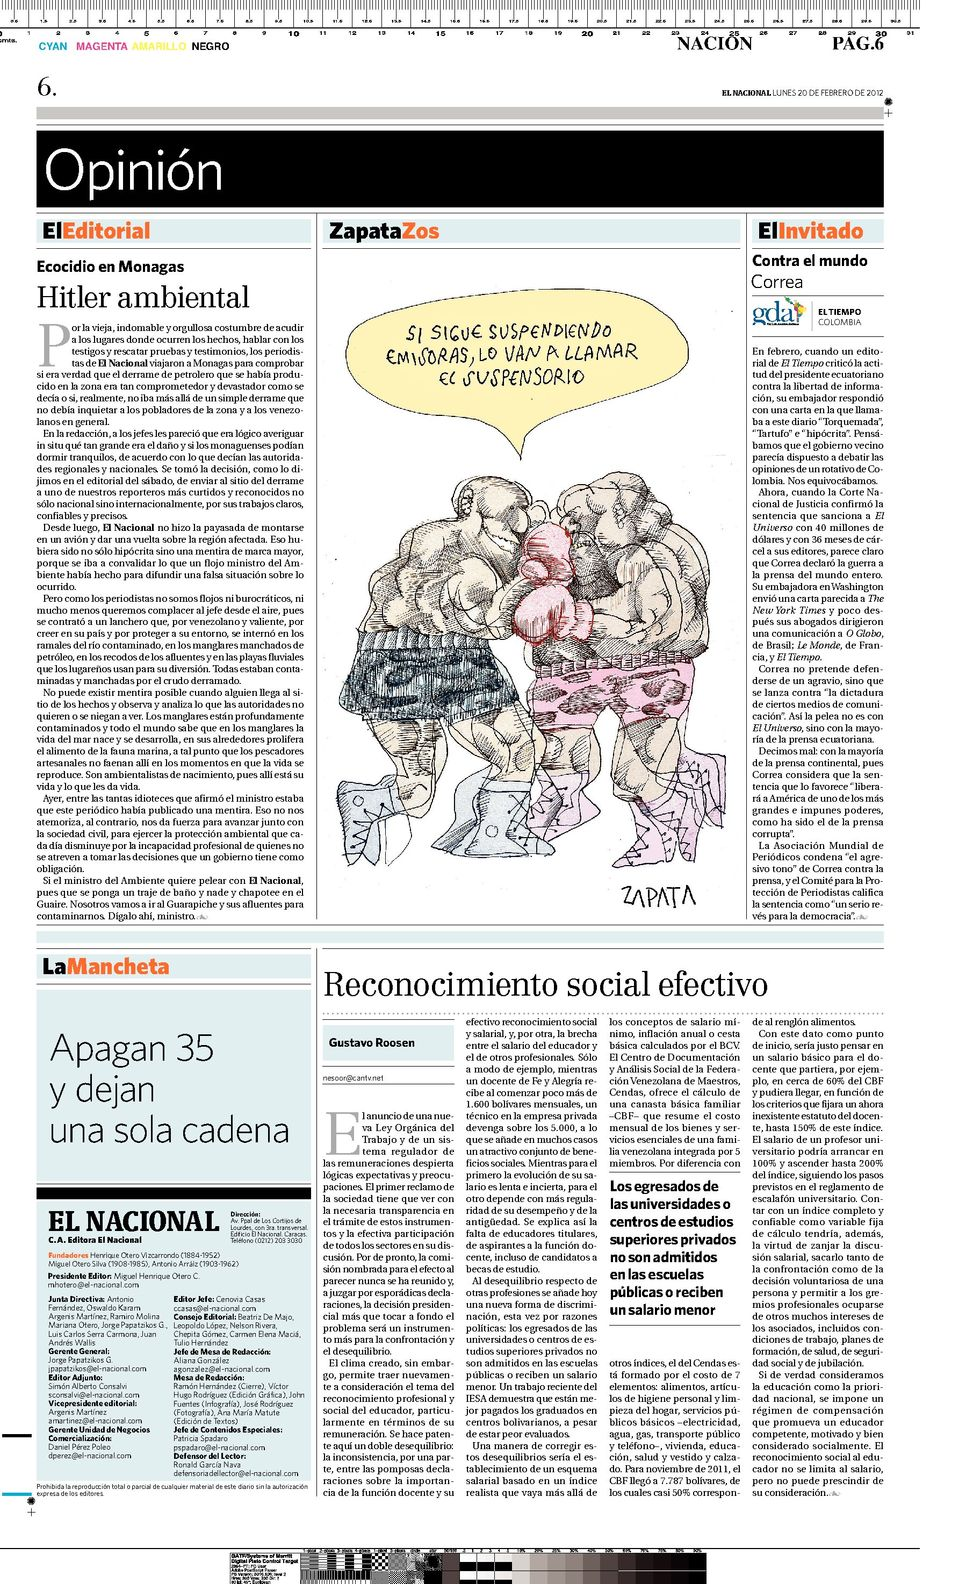 Periodismo comunitario mancheta for Editorial de un periodico mural